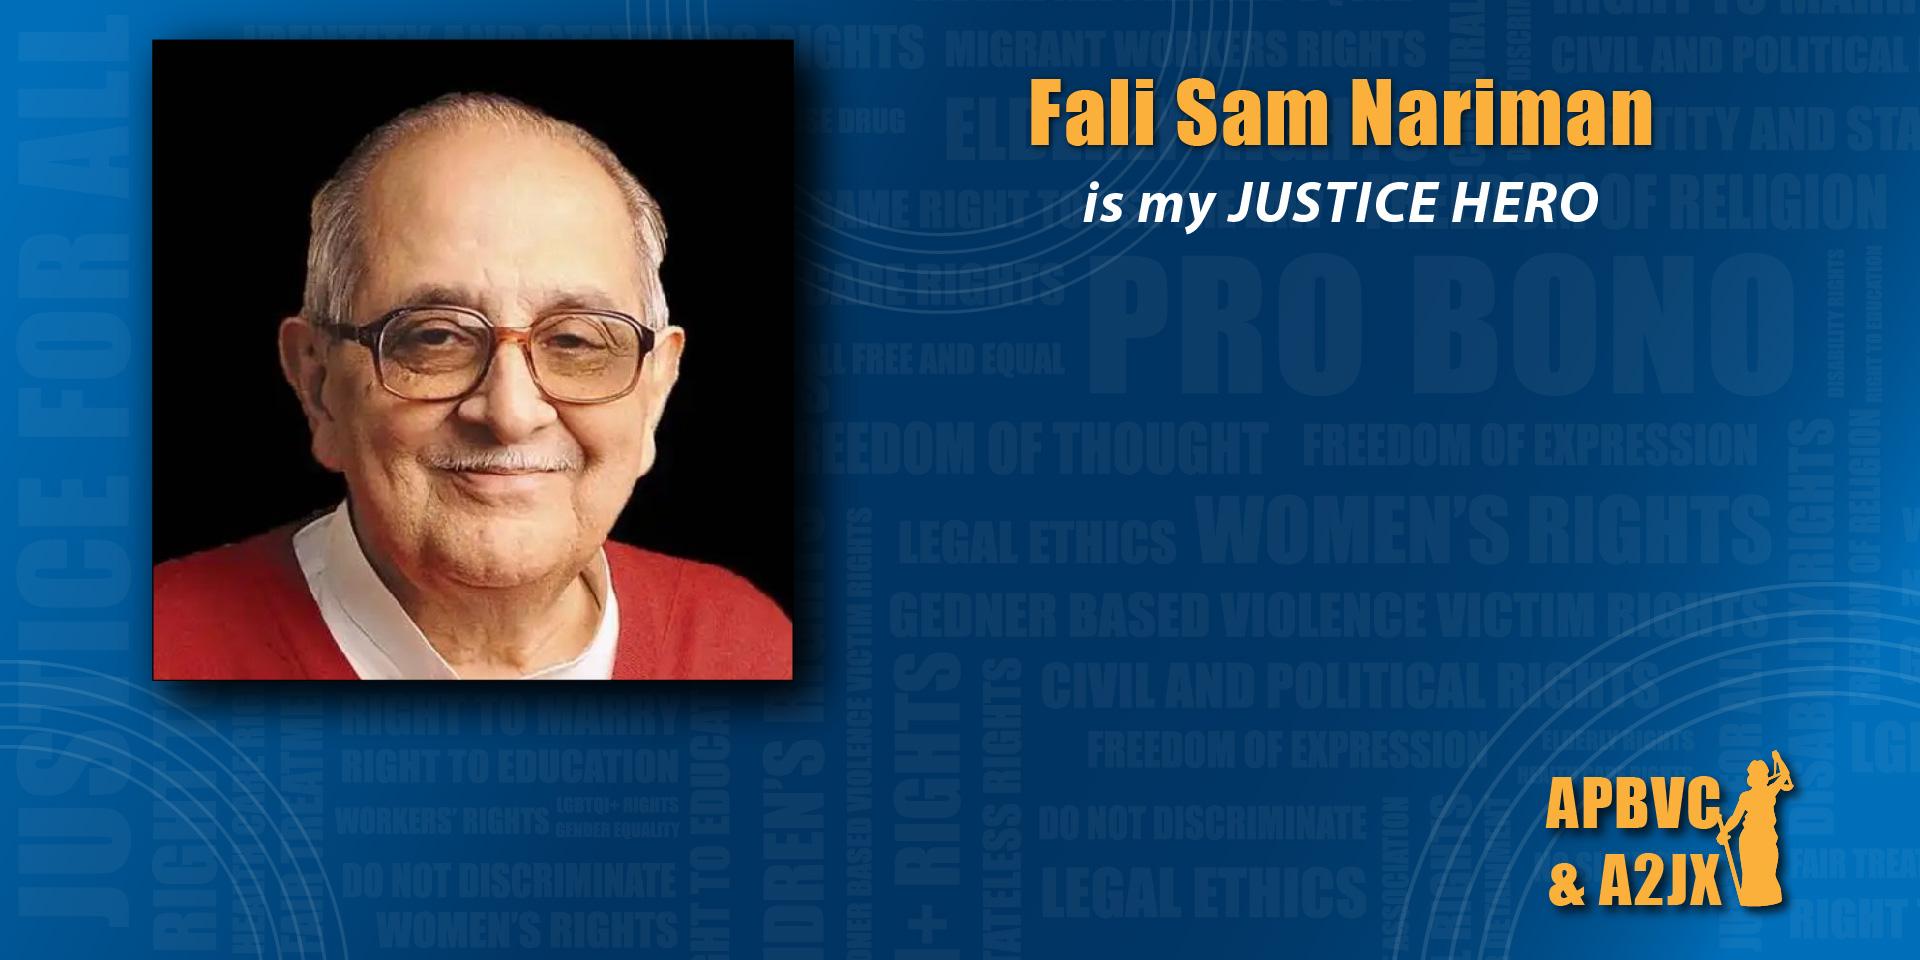 Fali Sam Nariman